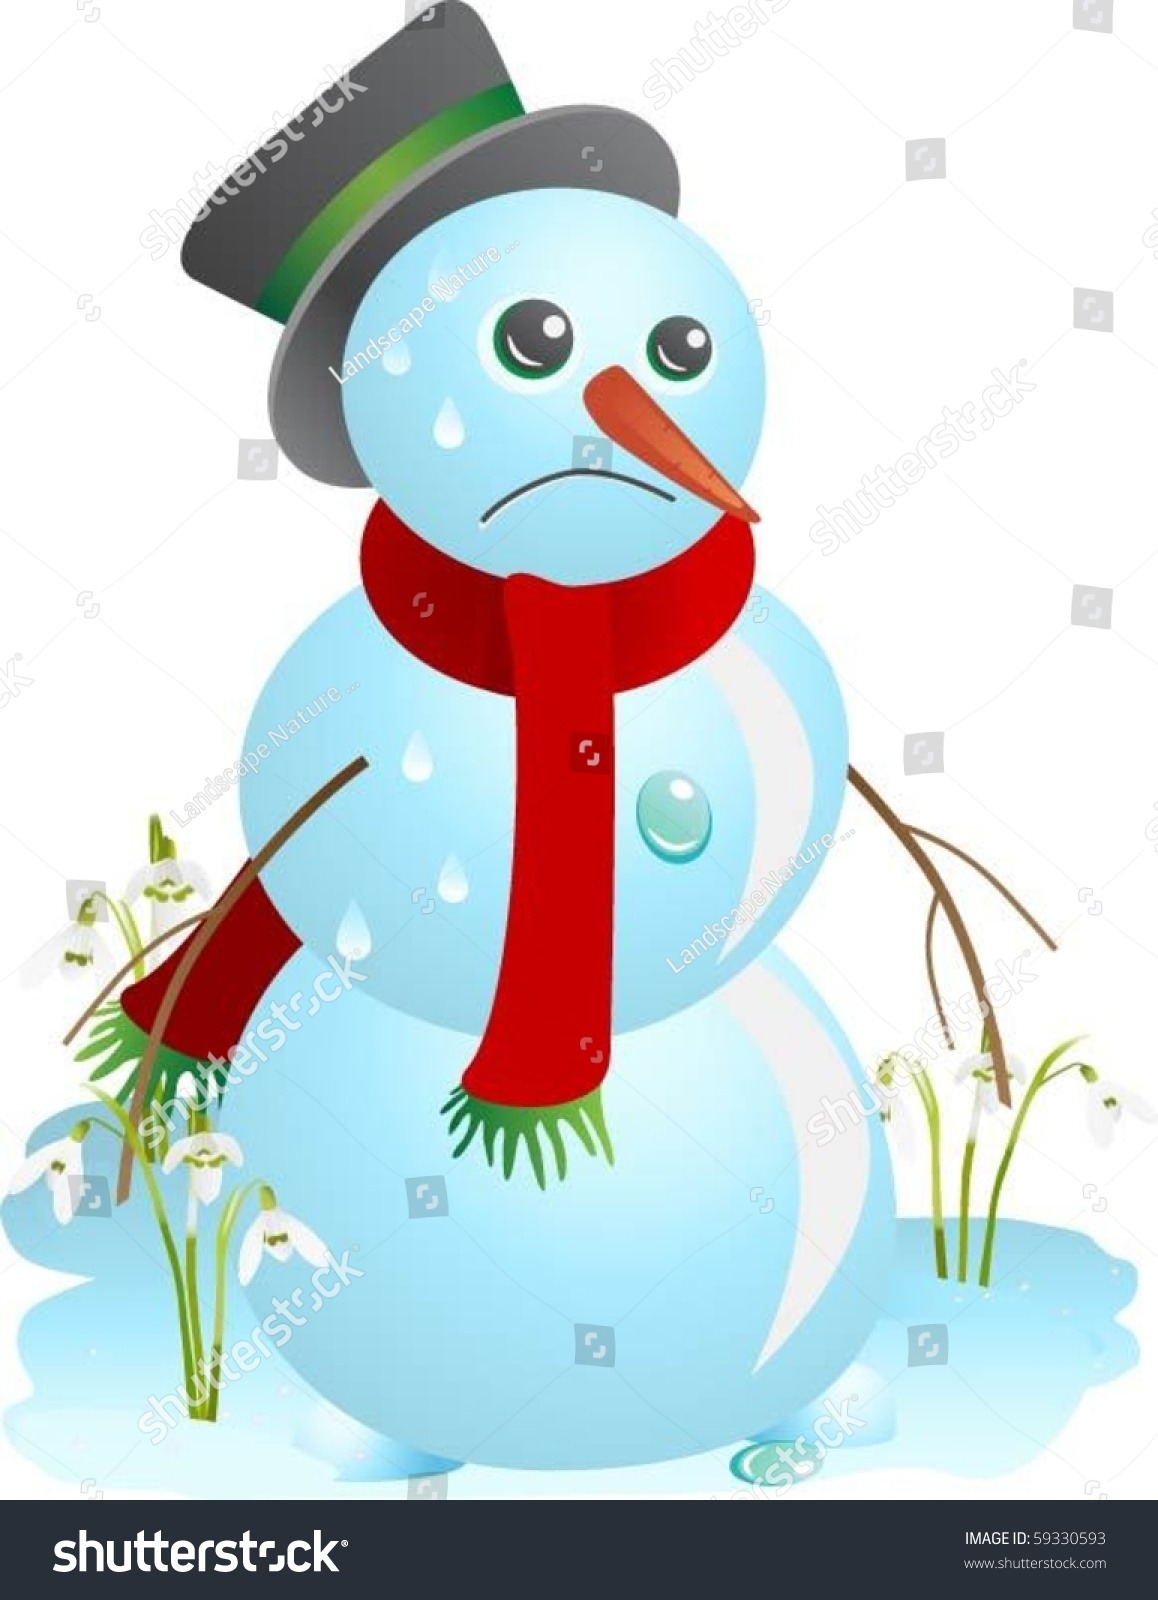 Snowman Face Stock Photos - Download 5,079 Royalty Free Photos  |Sad Melting Snowman